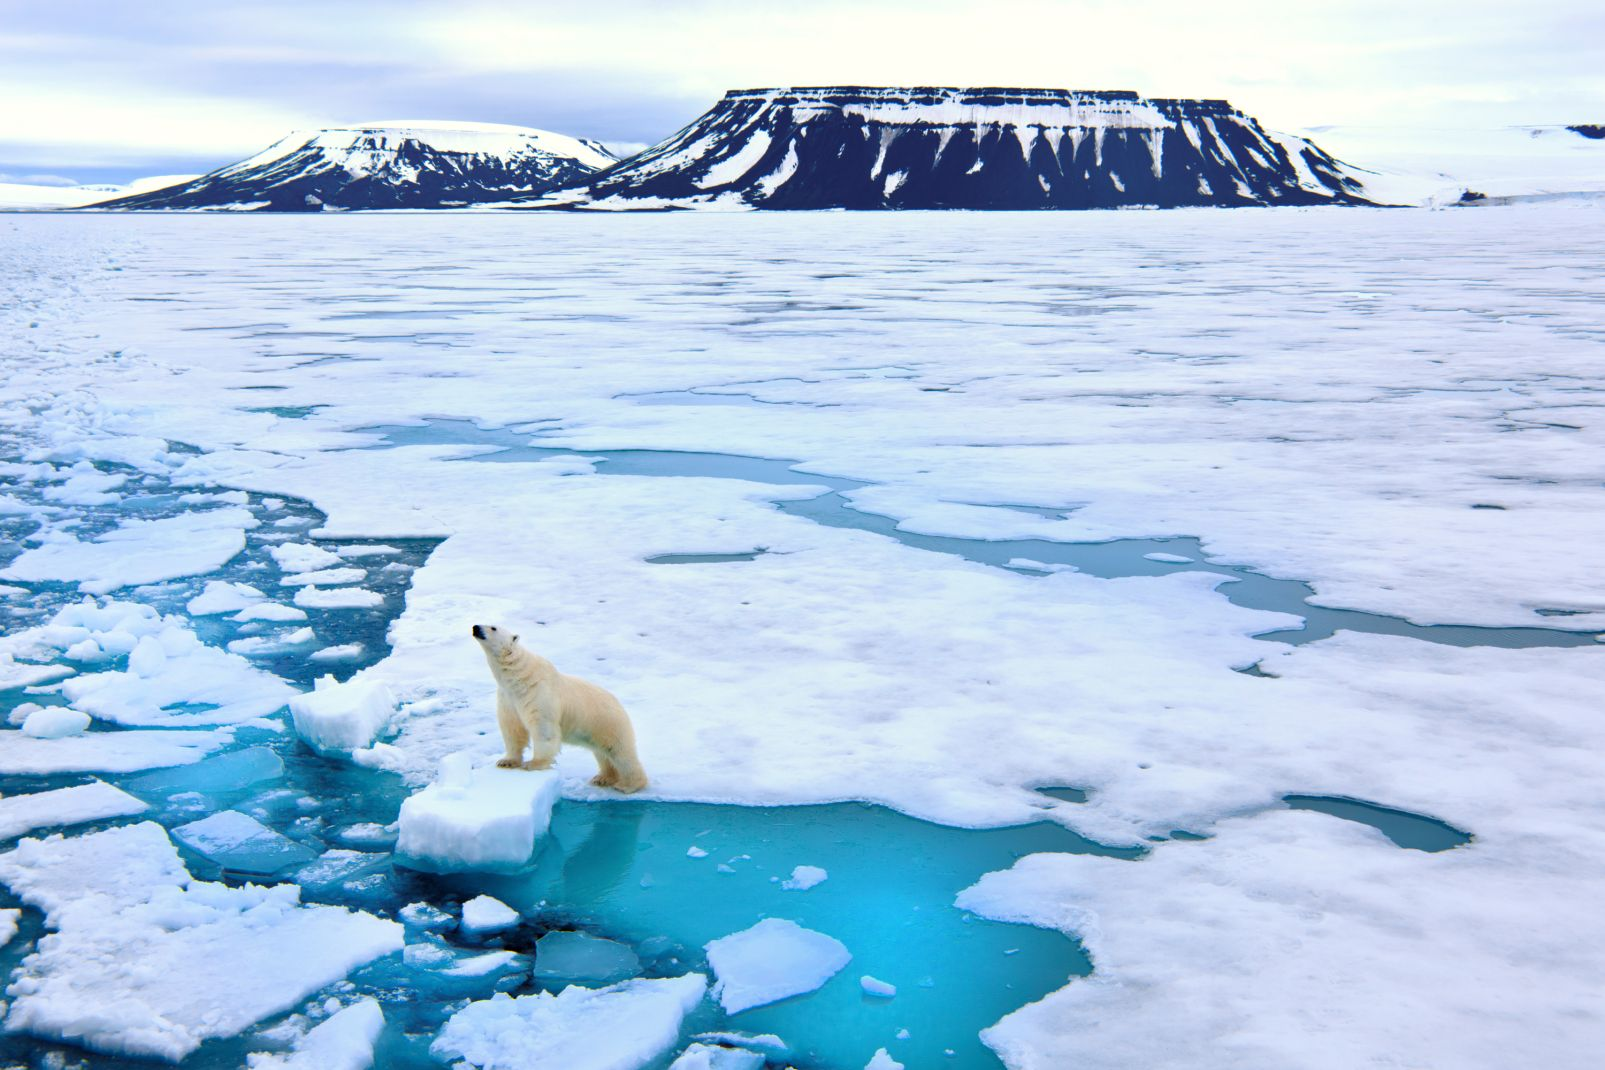 Svalbard and Jan Mayen Islands